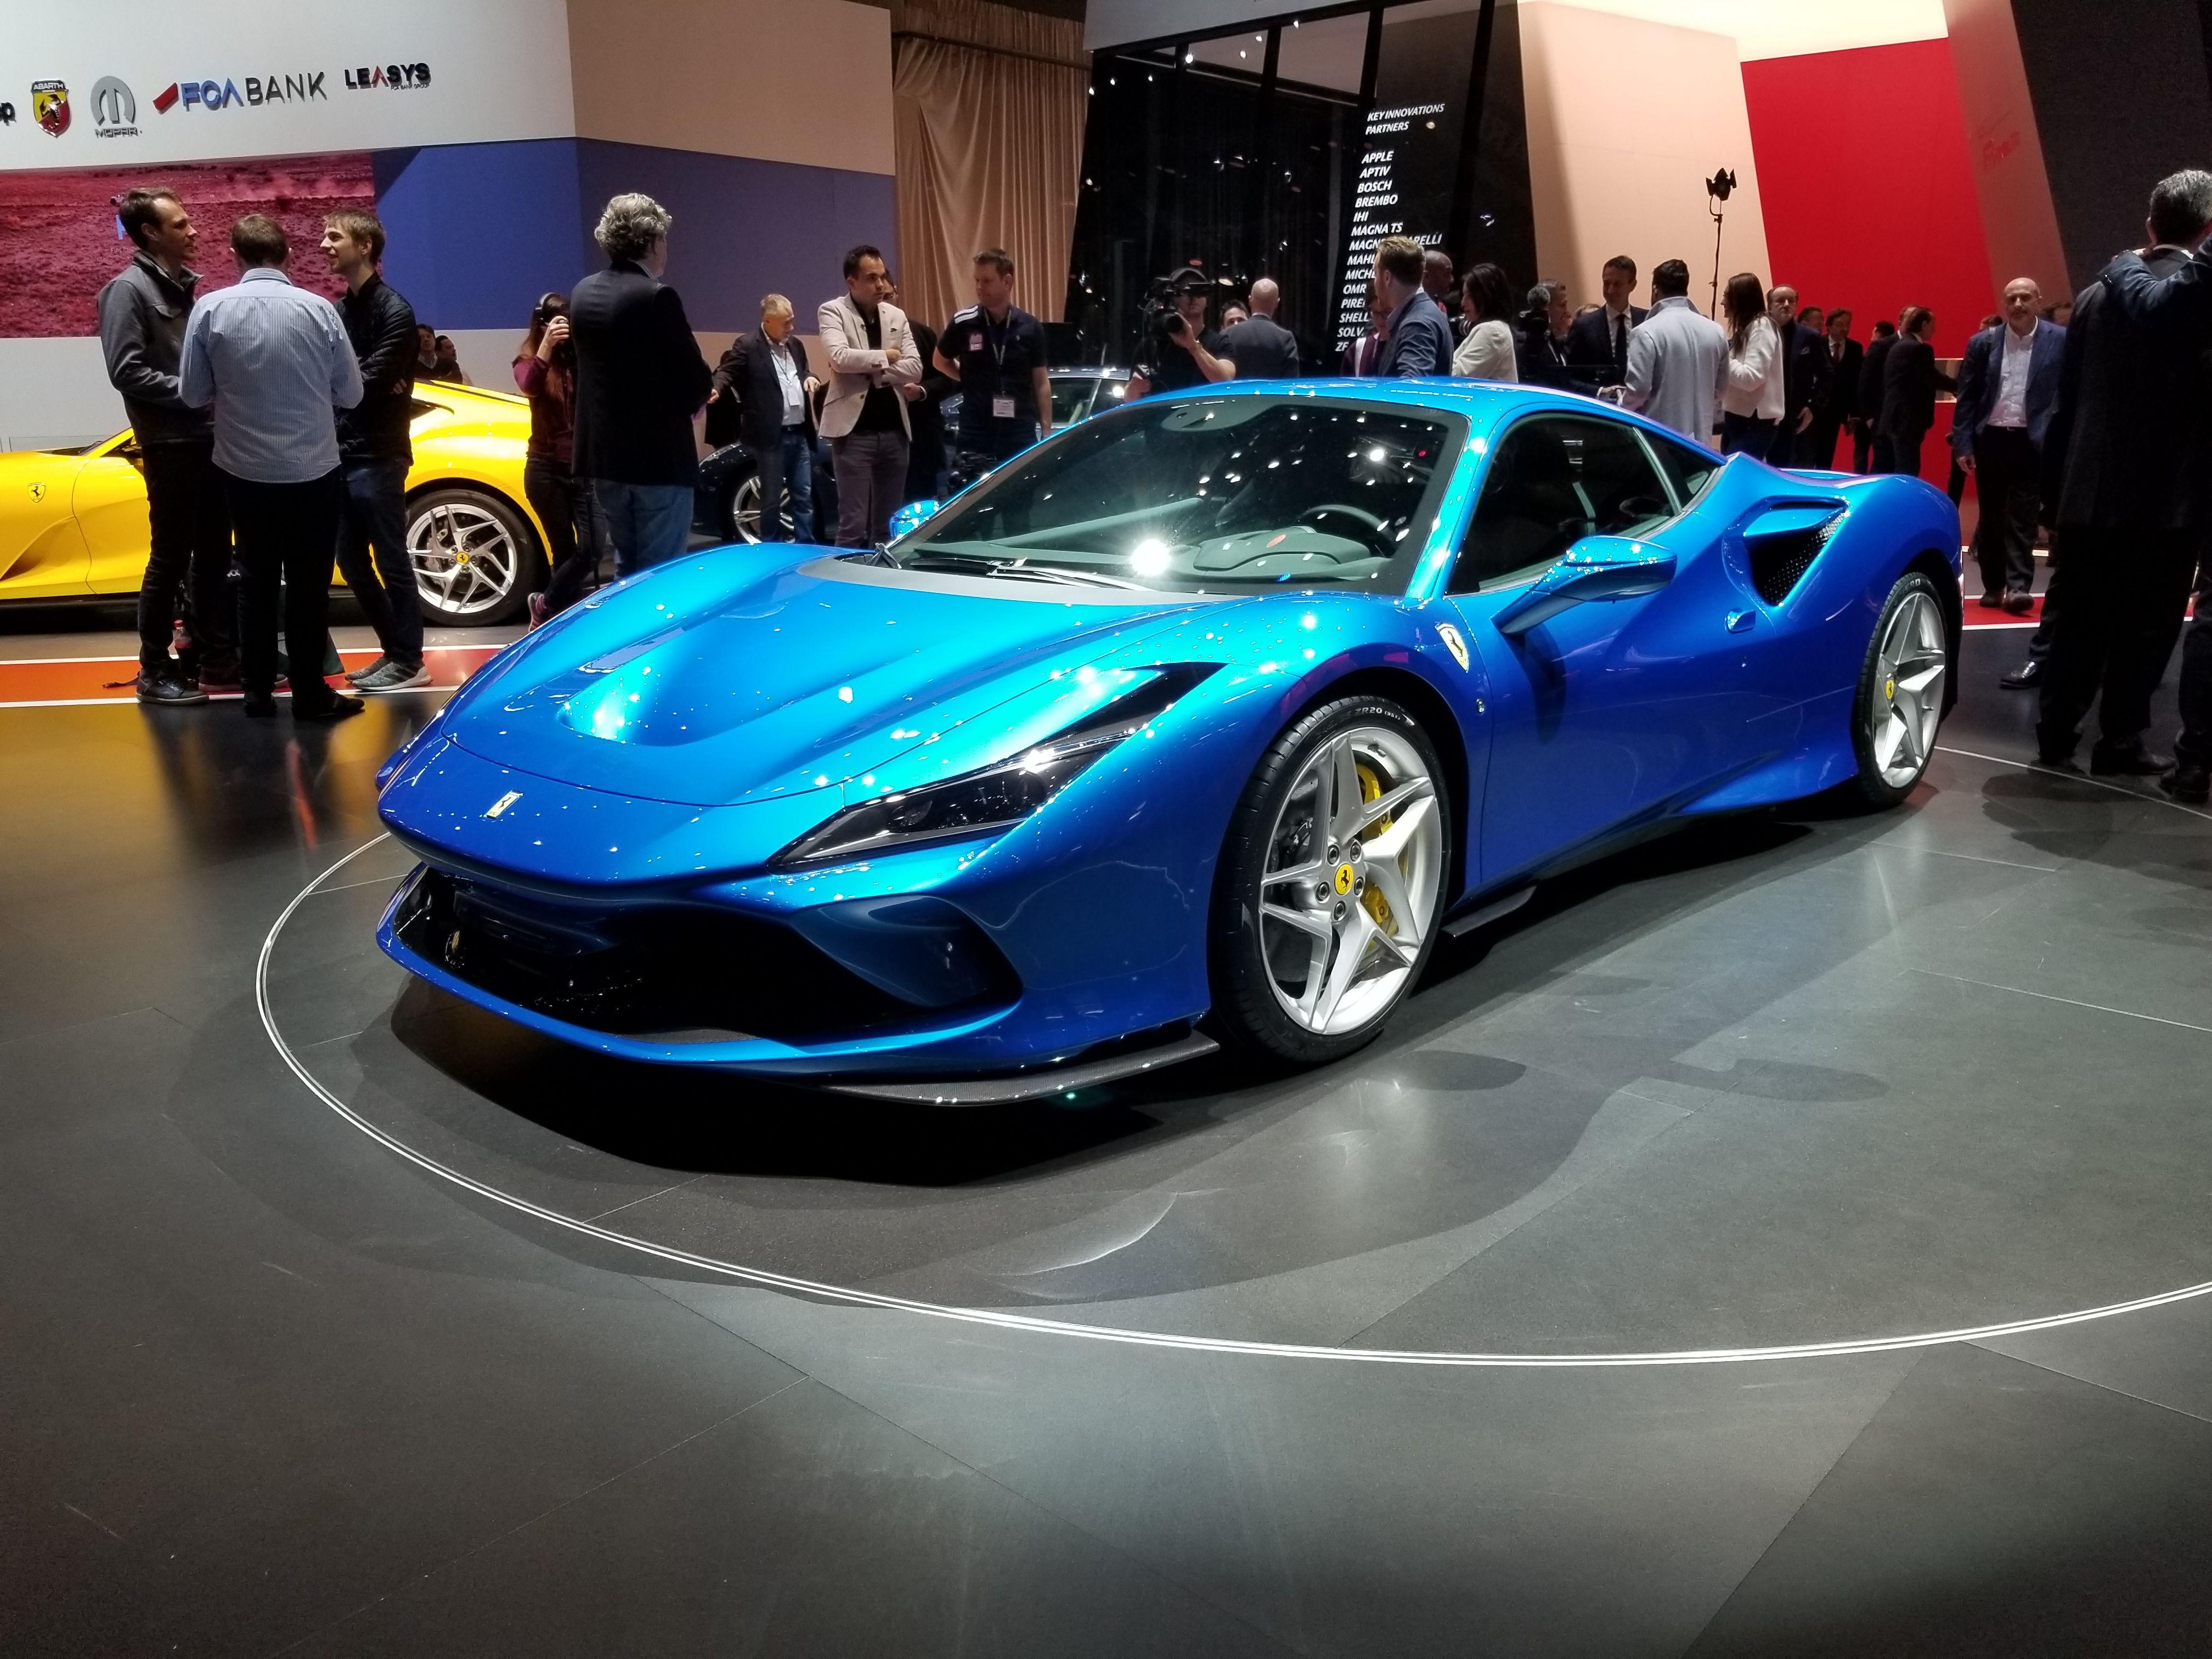 The 2020 Ferrari F8 Tributo Looks Amazing Heralds Good Things For Ferrari S Styling Language Top Speed Ferrari Testarossa Ferrari Ferrari World